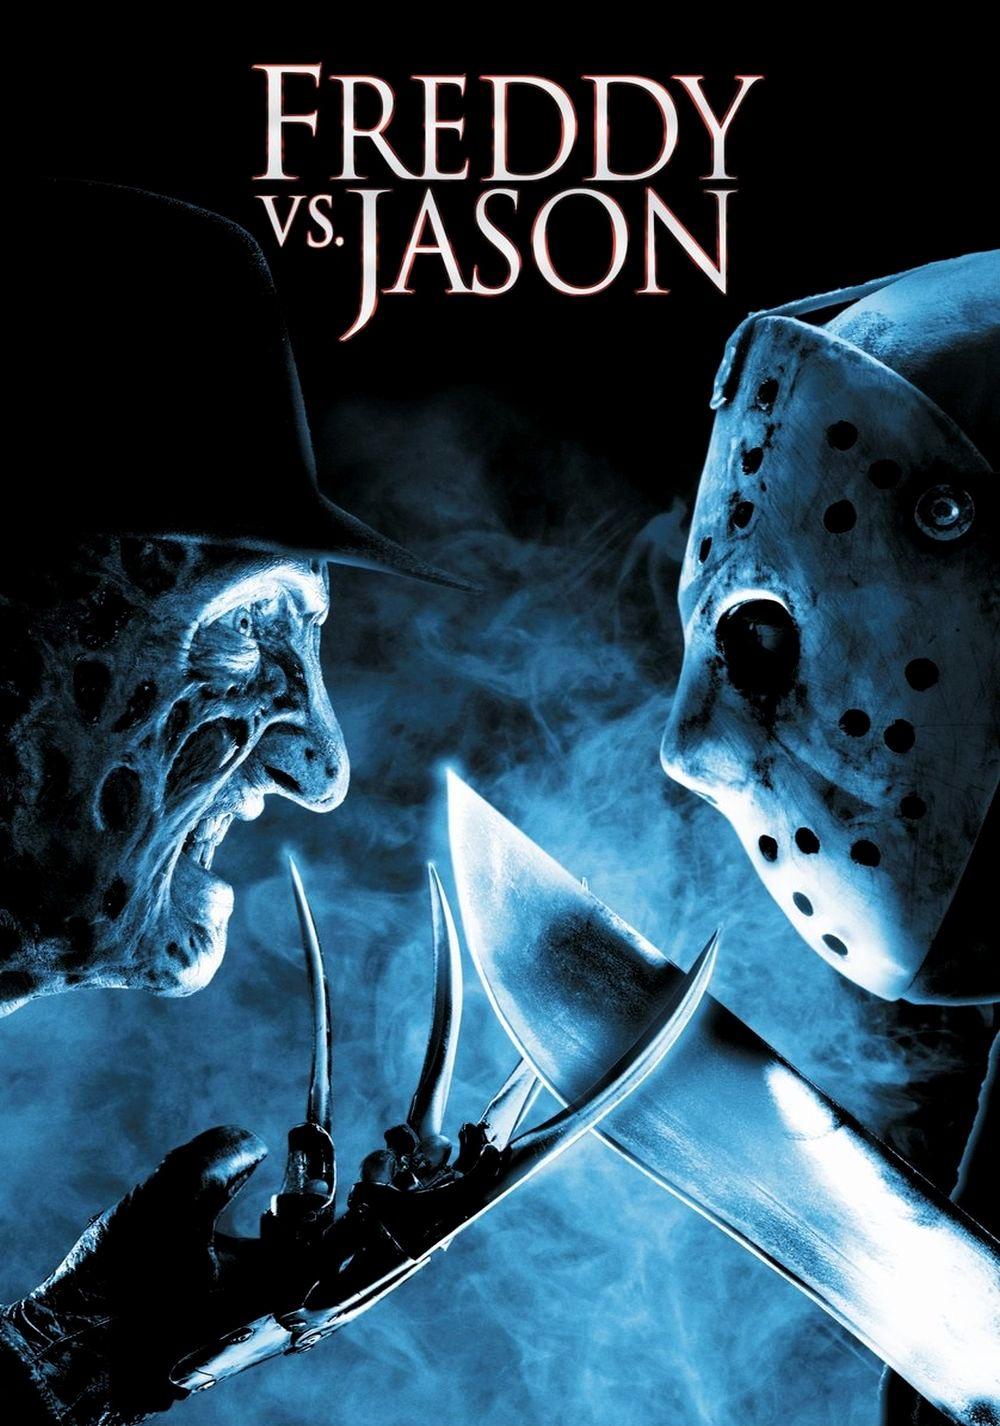 freddy vs jason full movie english version